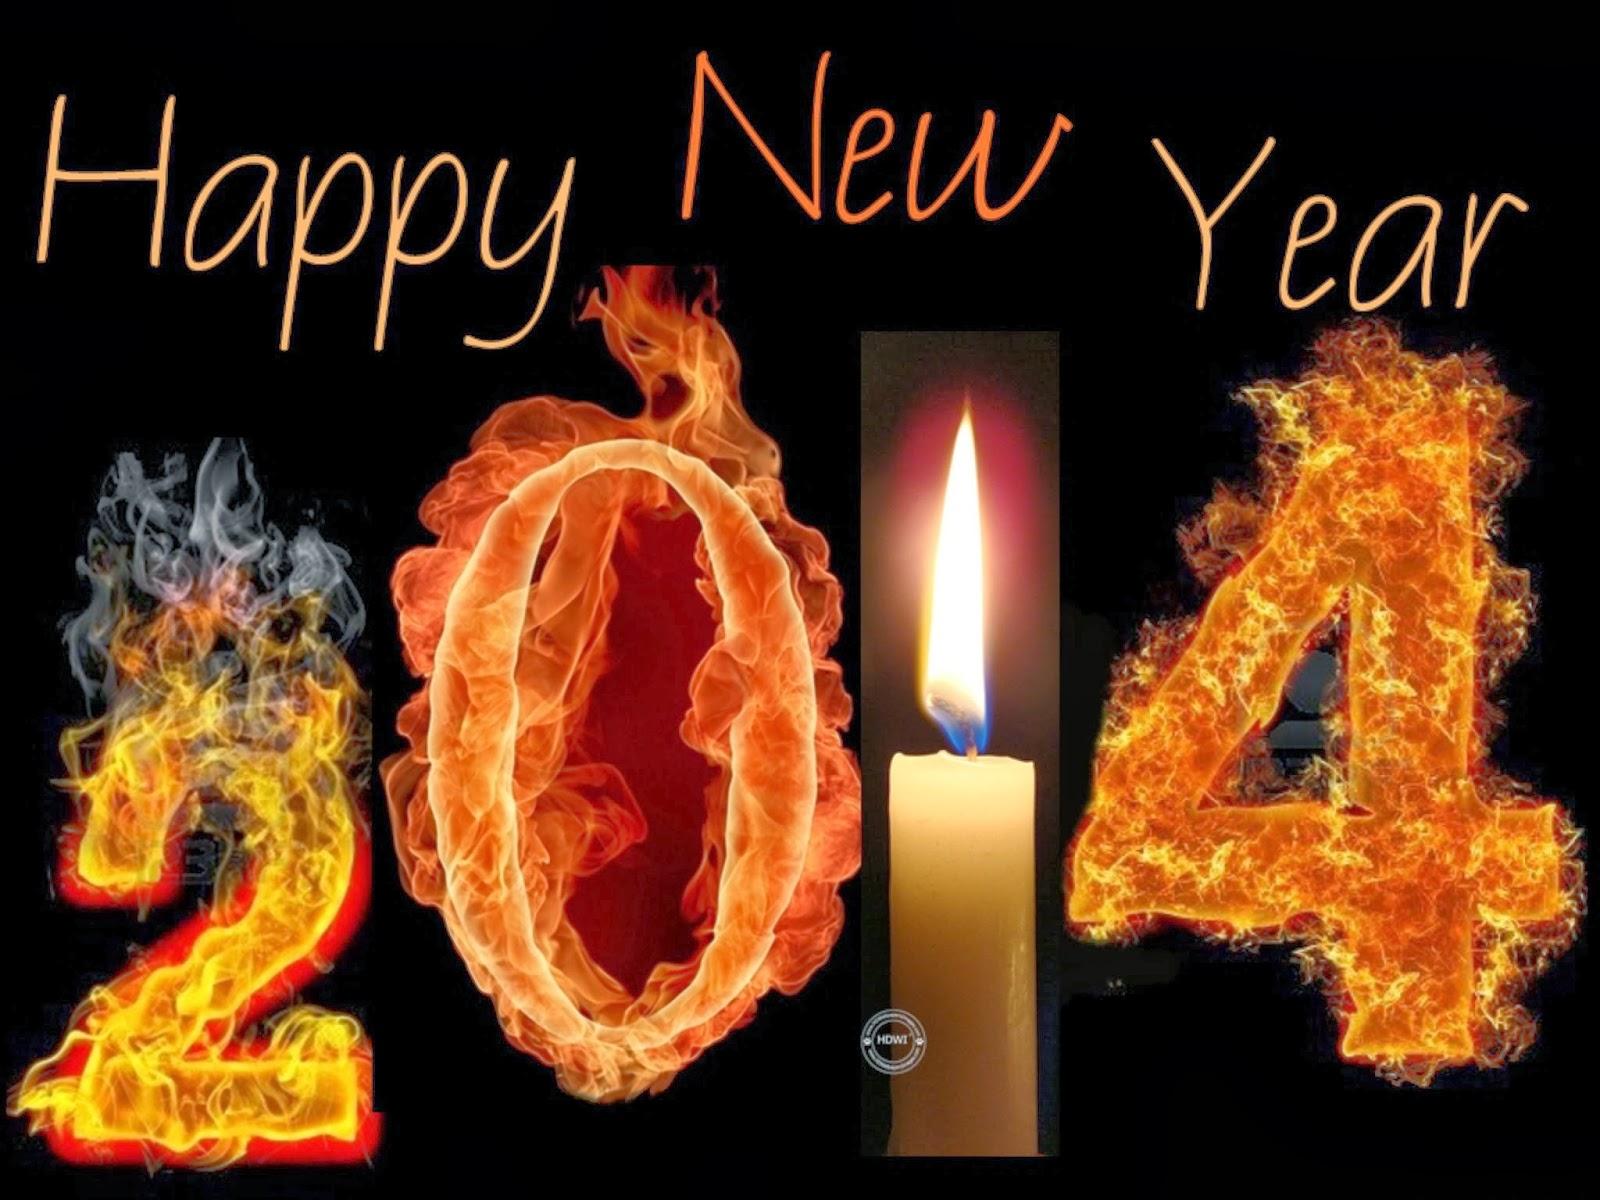 GAMBAR UCAPAN SELAMAT TAHUN BARU 2014 SMS BBM Kartu Tahun Baru